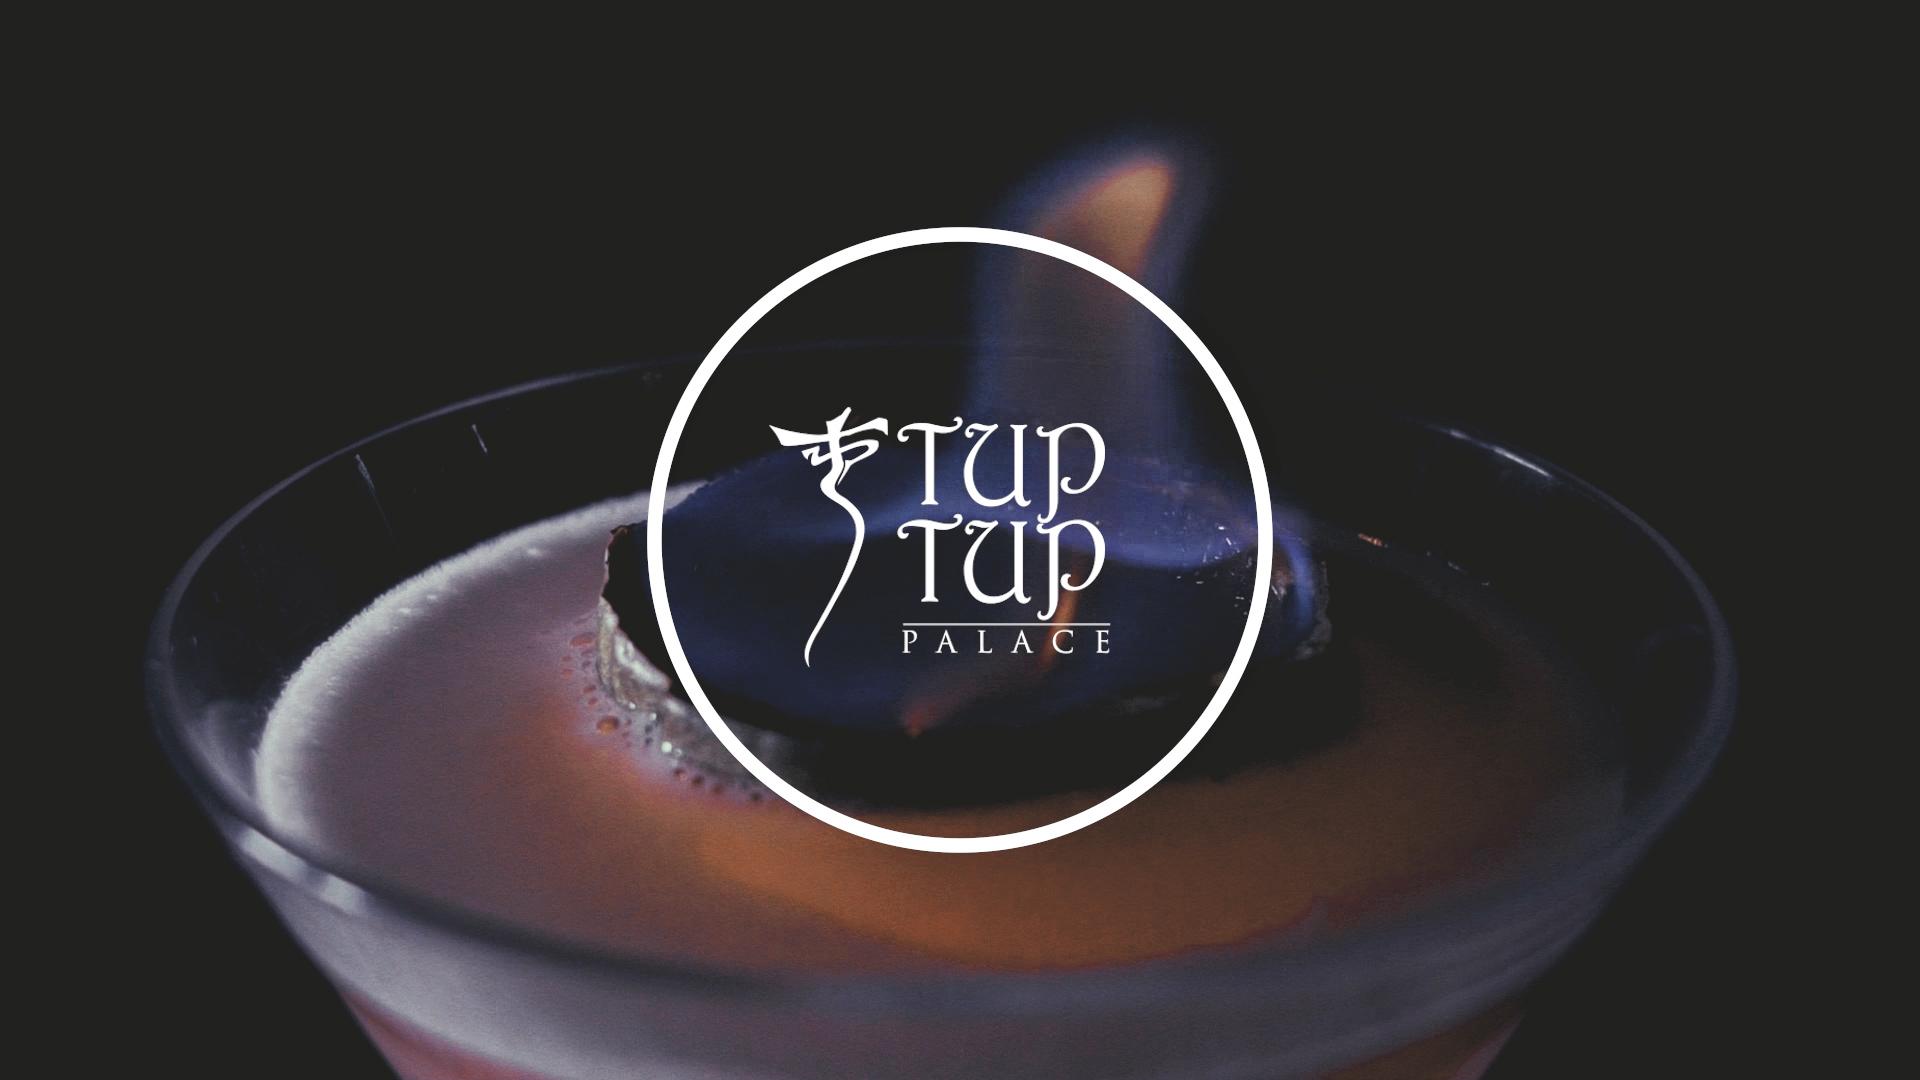 Tup Tup Palace – Case Study